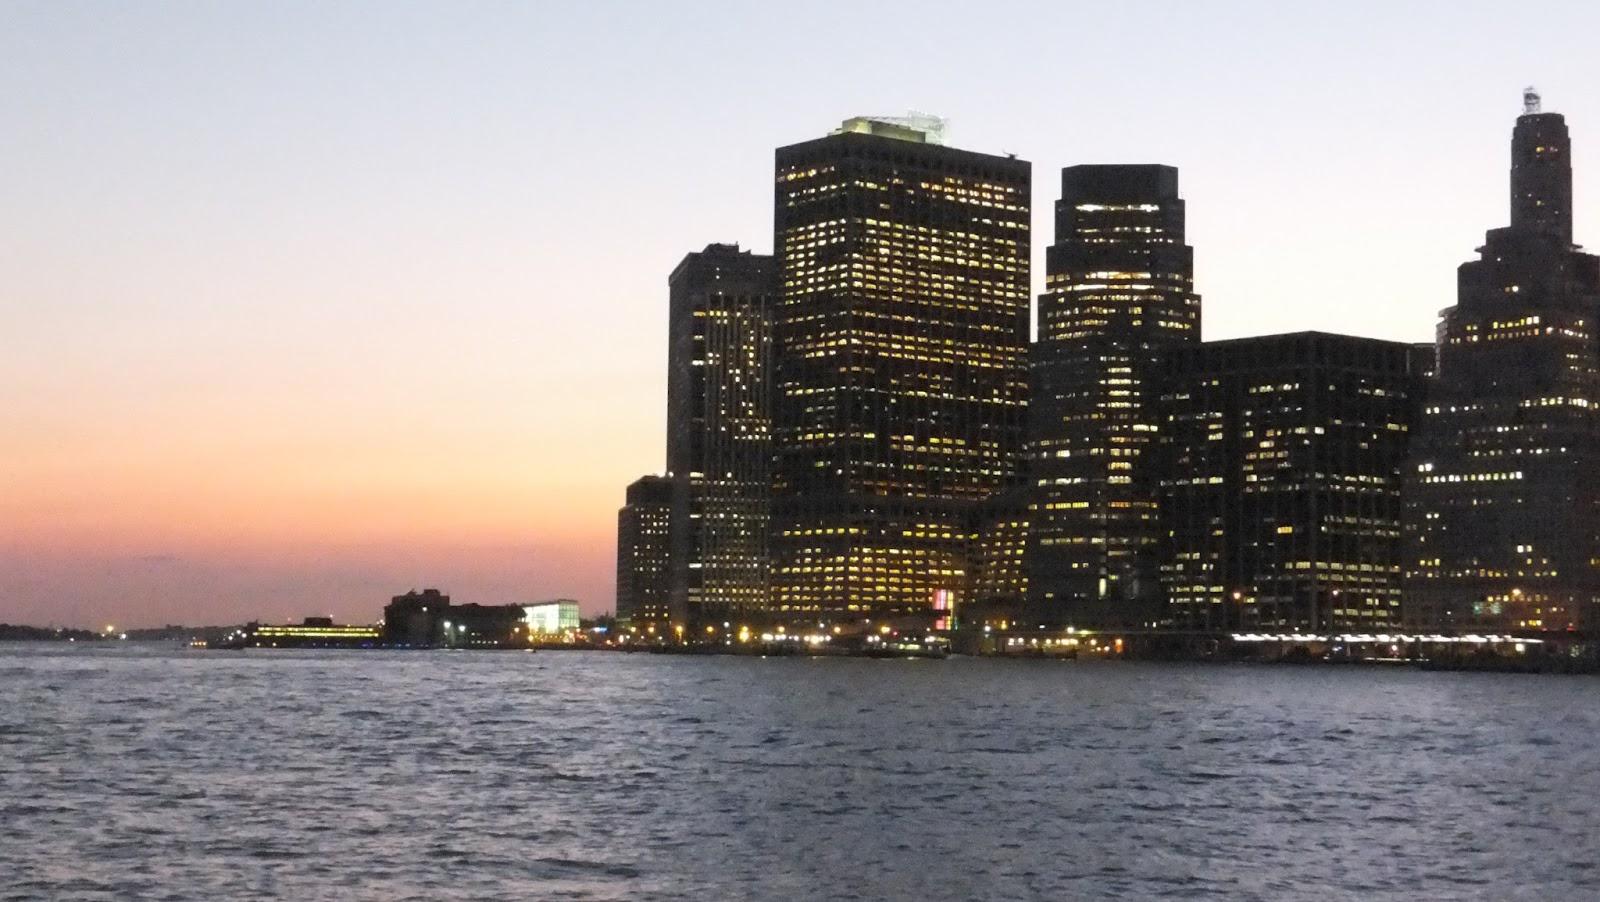 Manhattan at dusk, Brooklyn Heights, New York, Elisa N, Blog de Viajes, Lifestyle, Travel